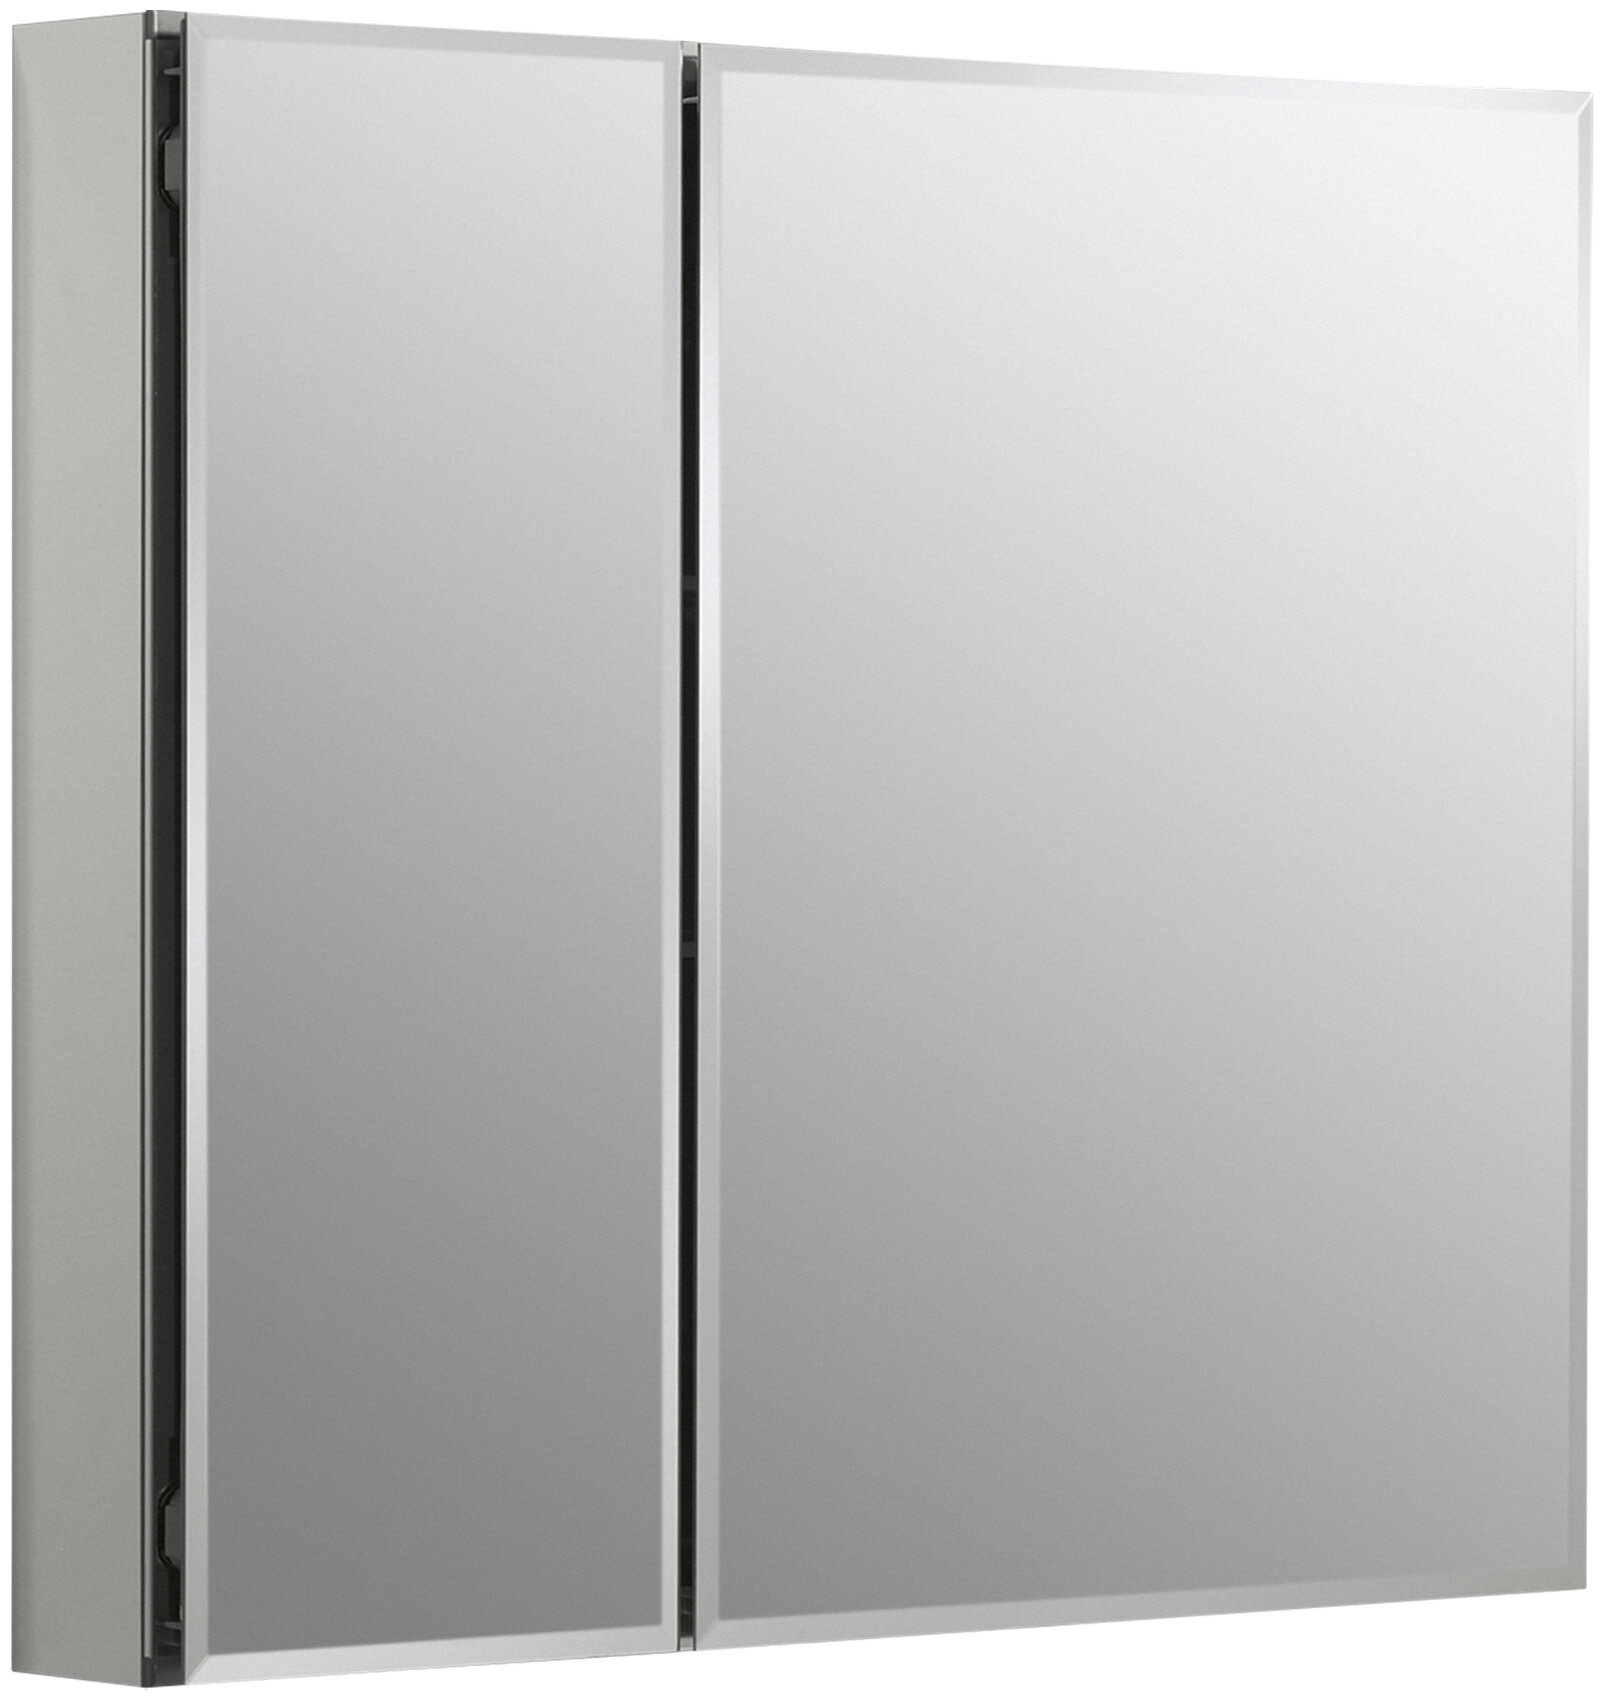 K Cb Clc3026fs 30 X 26 Aluminum Two Door Medicine Cabinet With Mirrored Doors Beveled Edges